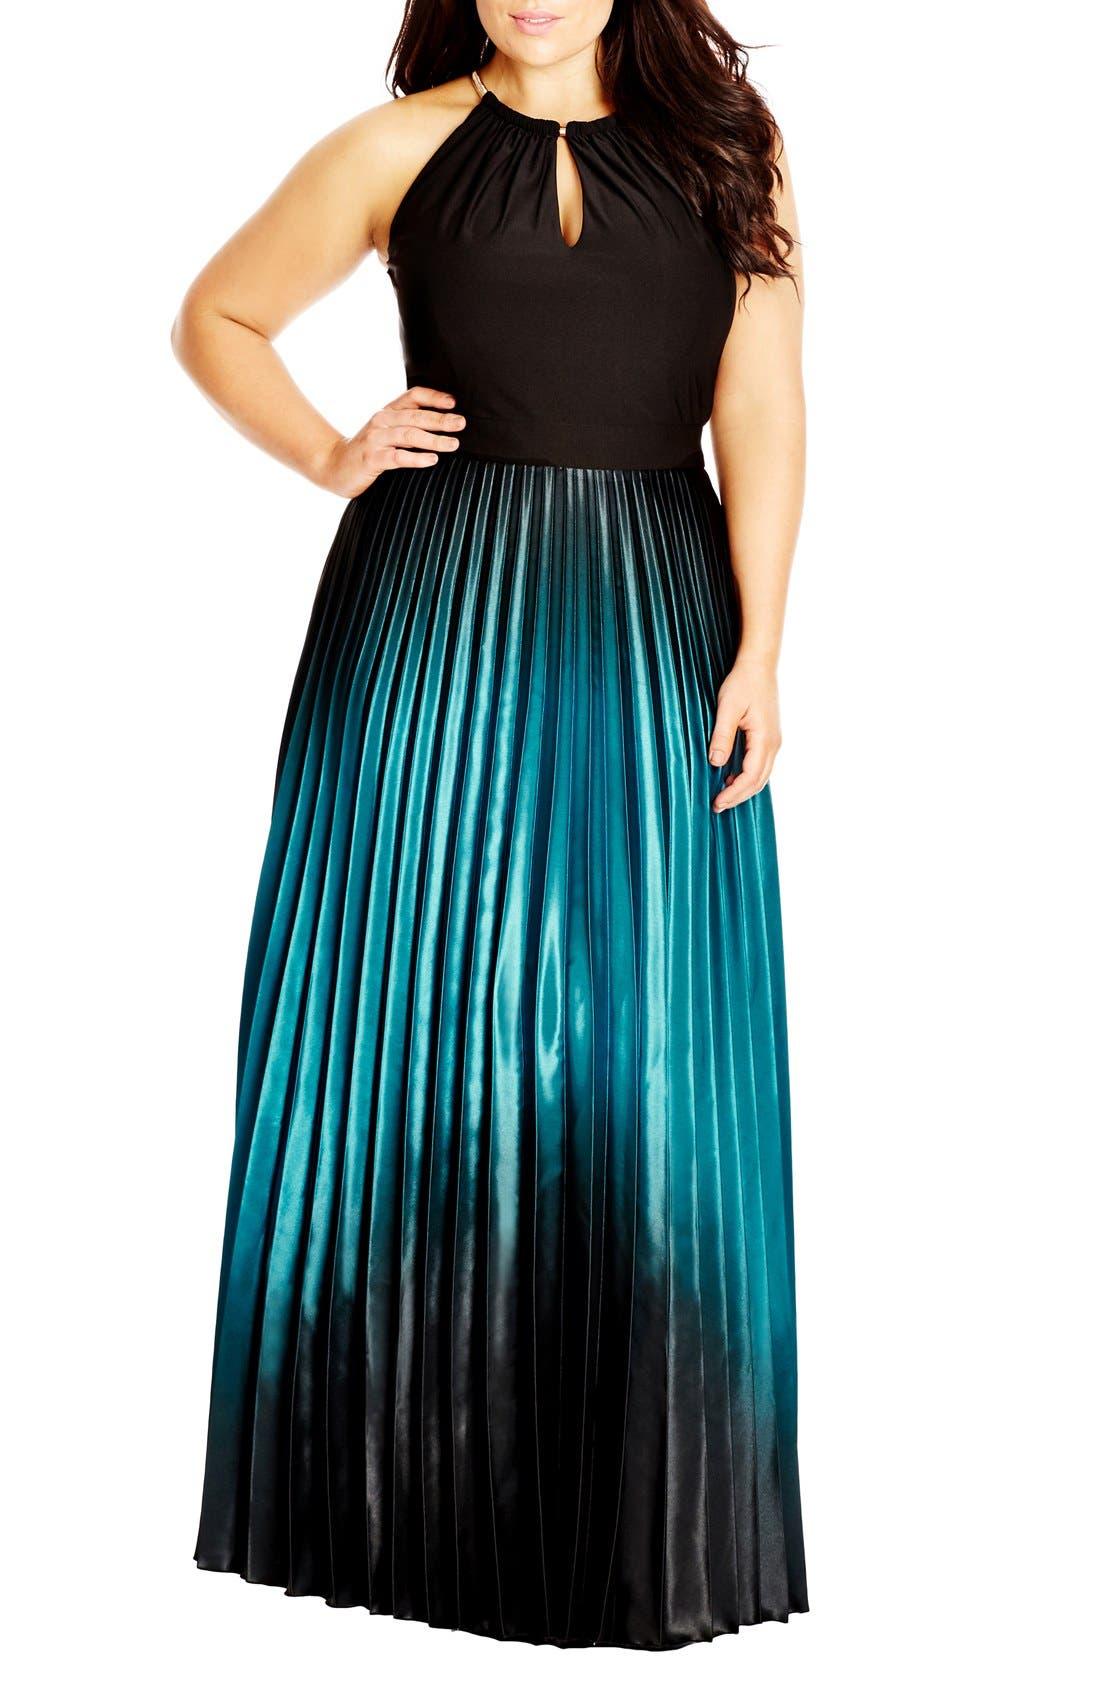 Maxi dress plus size canada